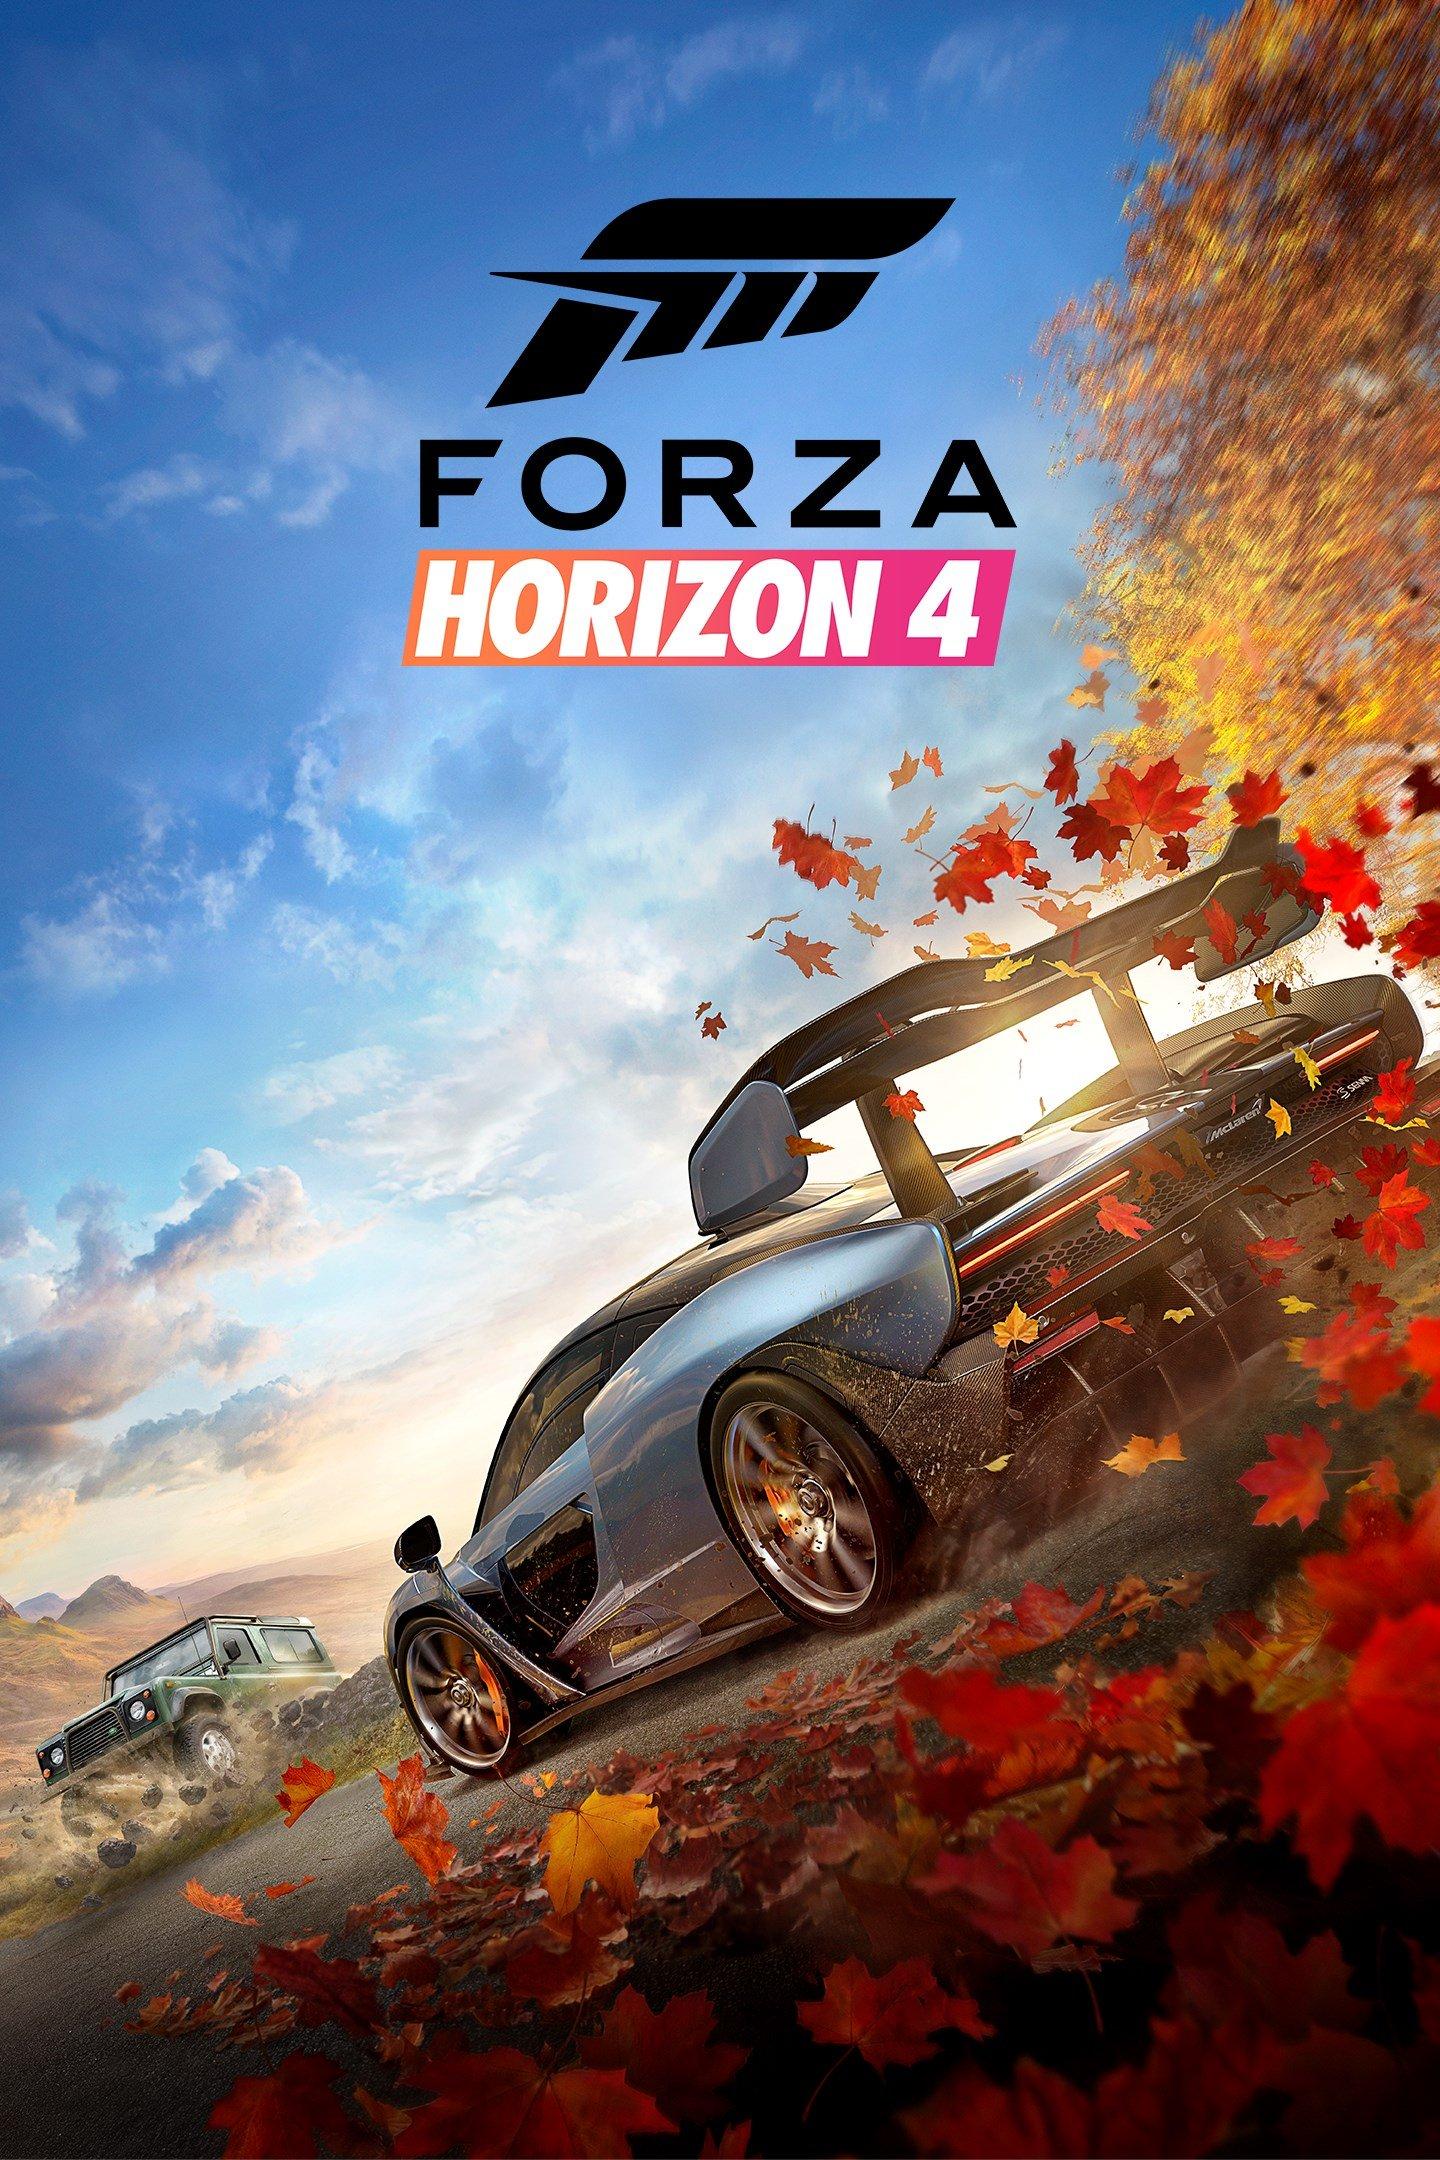 Poster for Forza Horizon 4